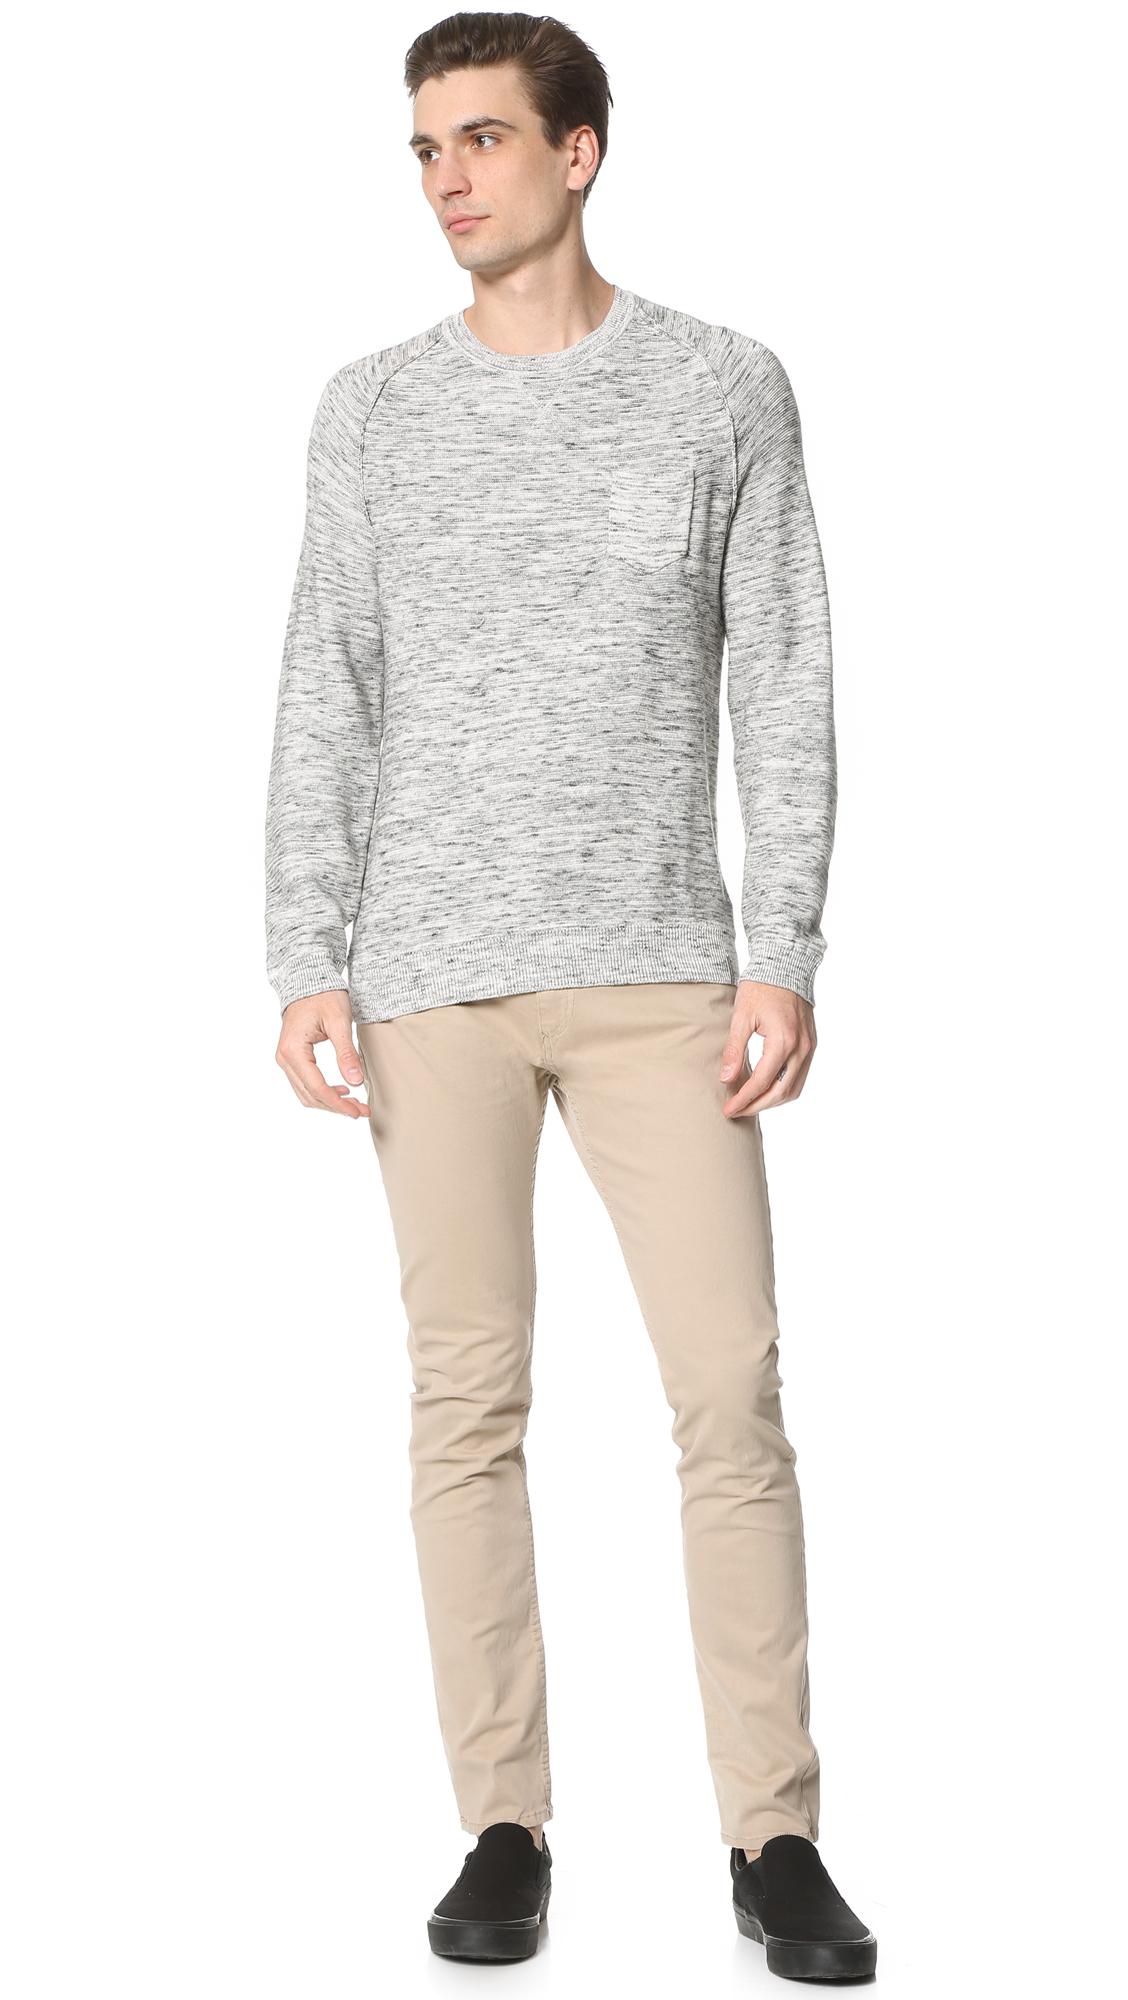 calvin klein jeans crew sweater in black for men lyst. Black Bedroom Furniture Sets. Home Design Ideas